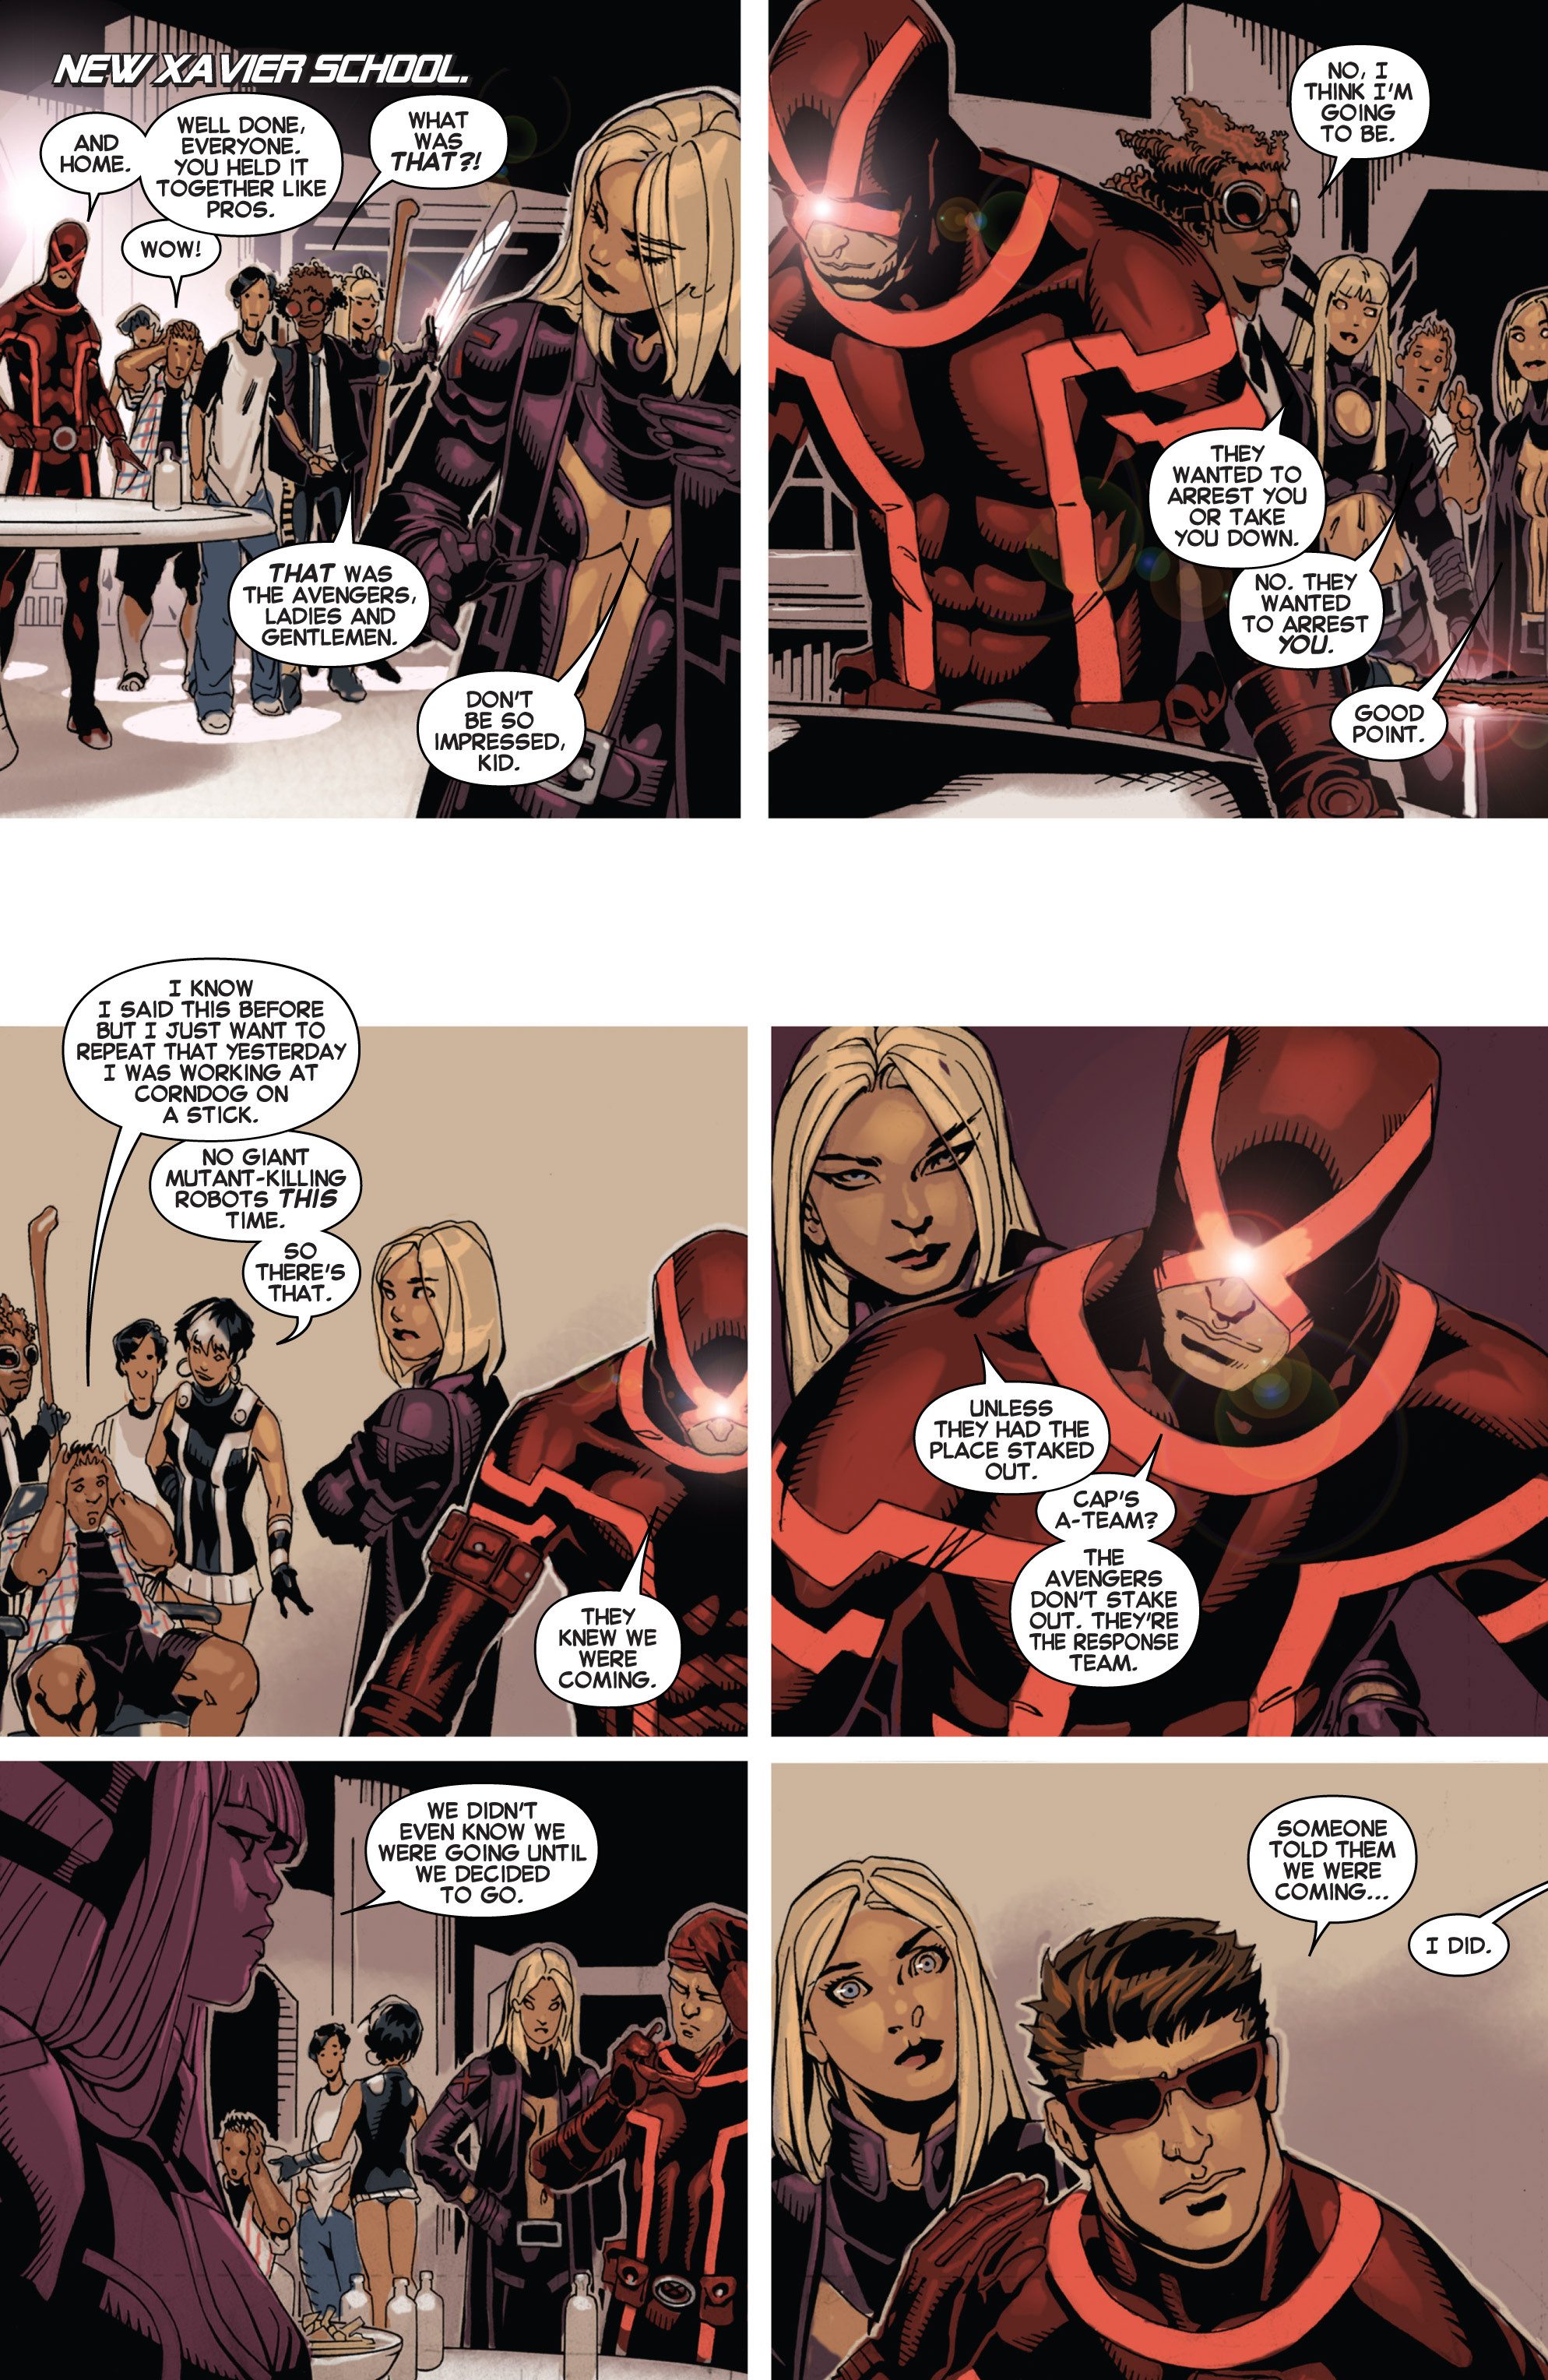 Read online Uncanny X-Men (2013) comic -  Issue # _TPB 1 - Revolution - 58